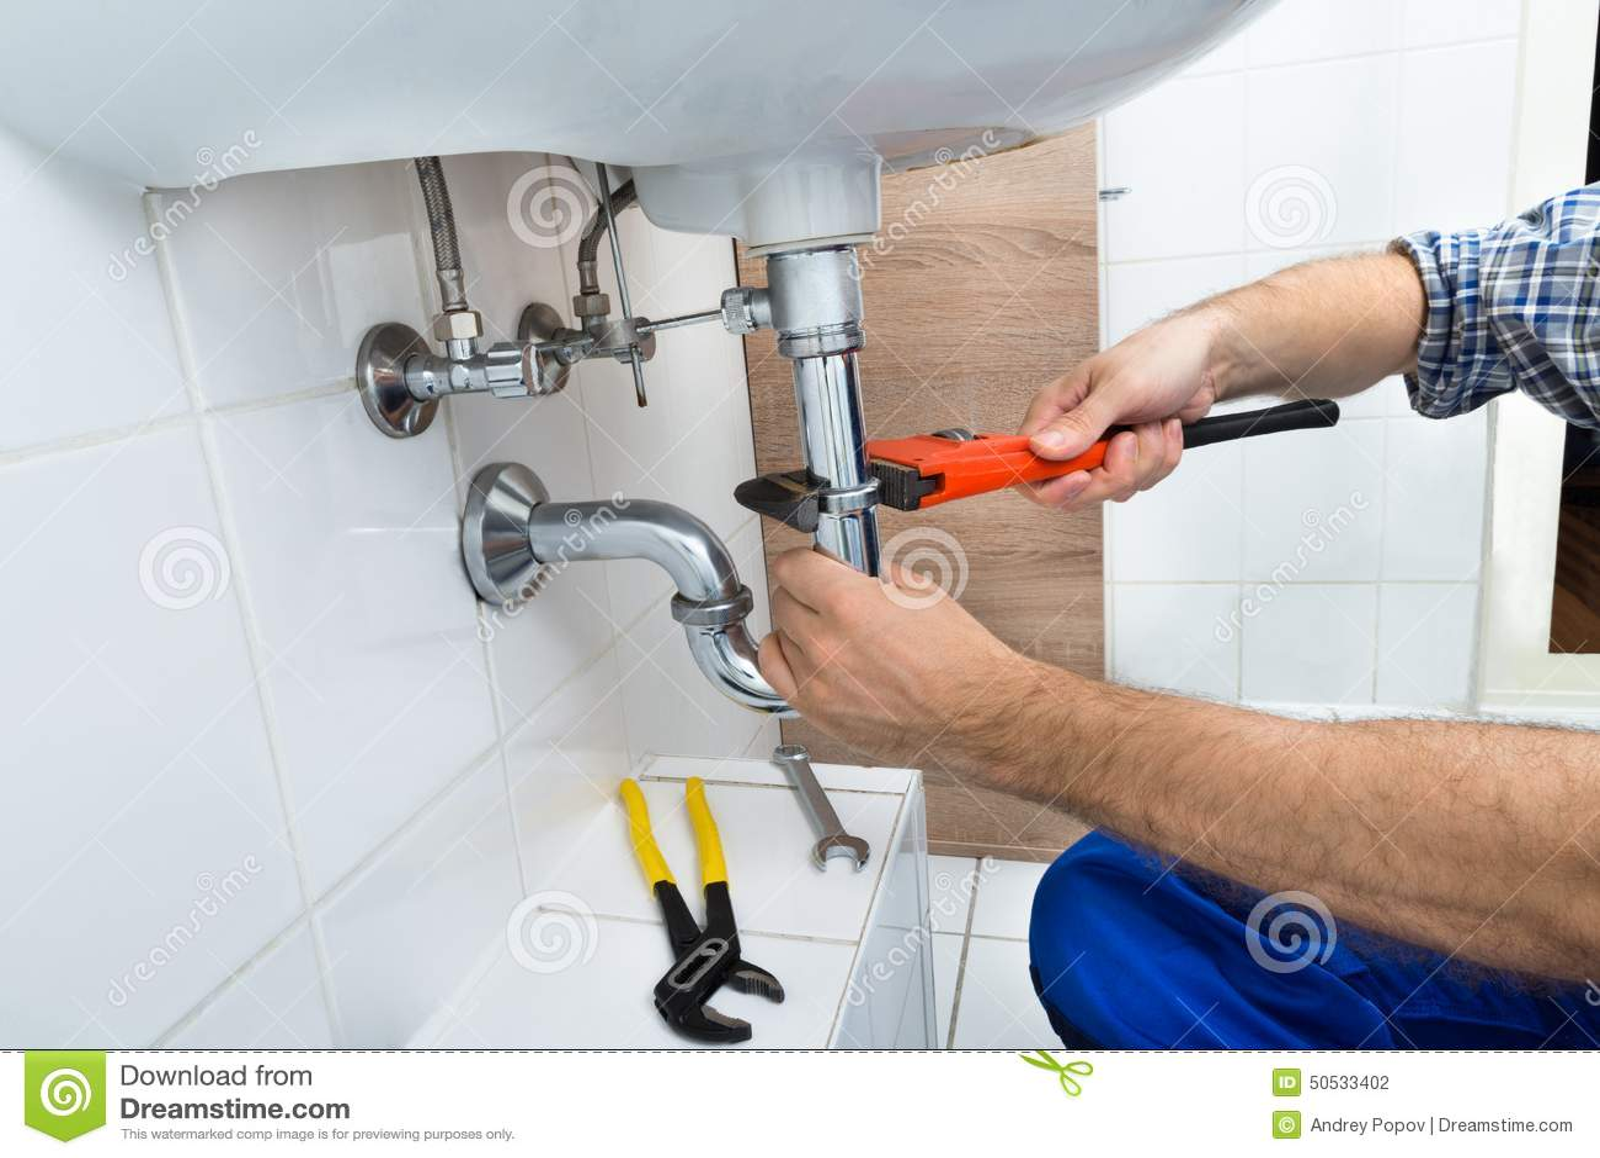 Male plumber fixing sink in bathroom stock photo image for Fixing bathroom sink